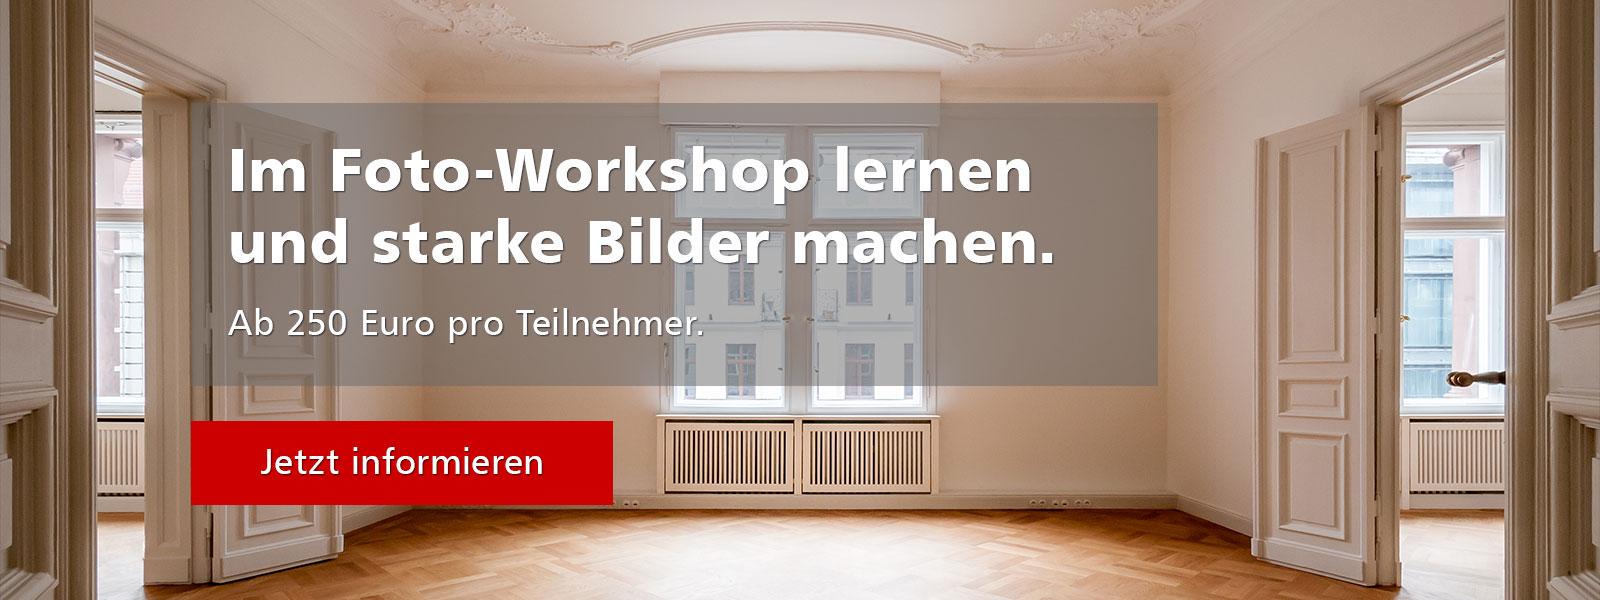 Workshop Immobilienfotografie ab 250 EUR pro Teilnehmer